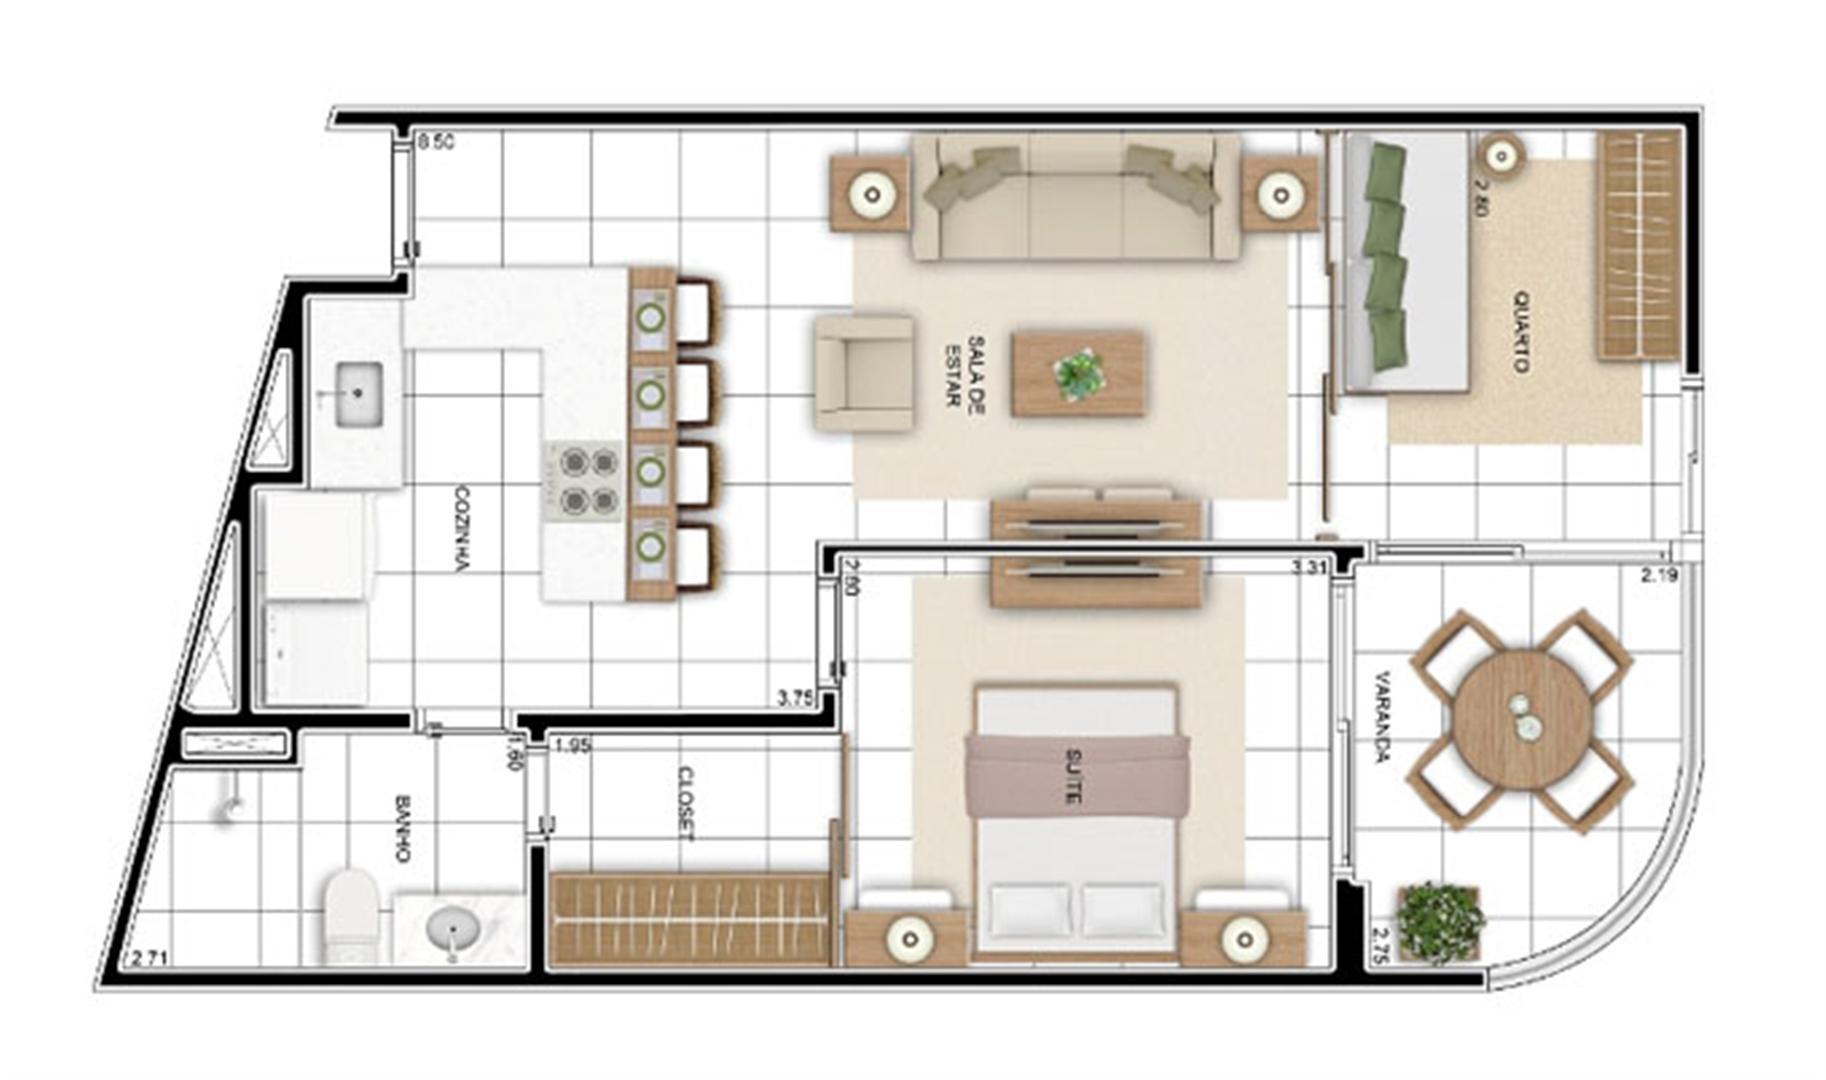 PLANTA - APTO TIPO C - 56 m² OPÇÃO 01  | In Mare Bali – Apartamento no  Distrito Litoral de Cotovelo - Parnamirim - Rio Grande do Norte